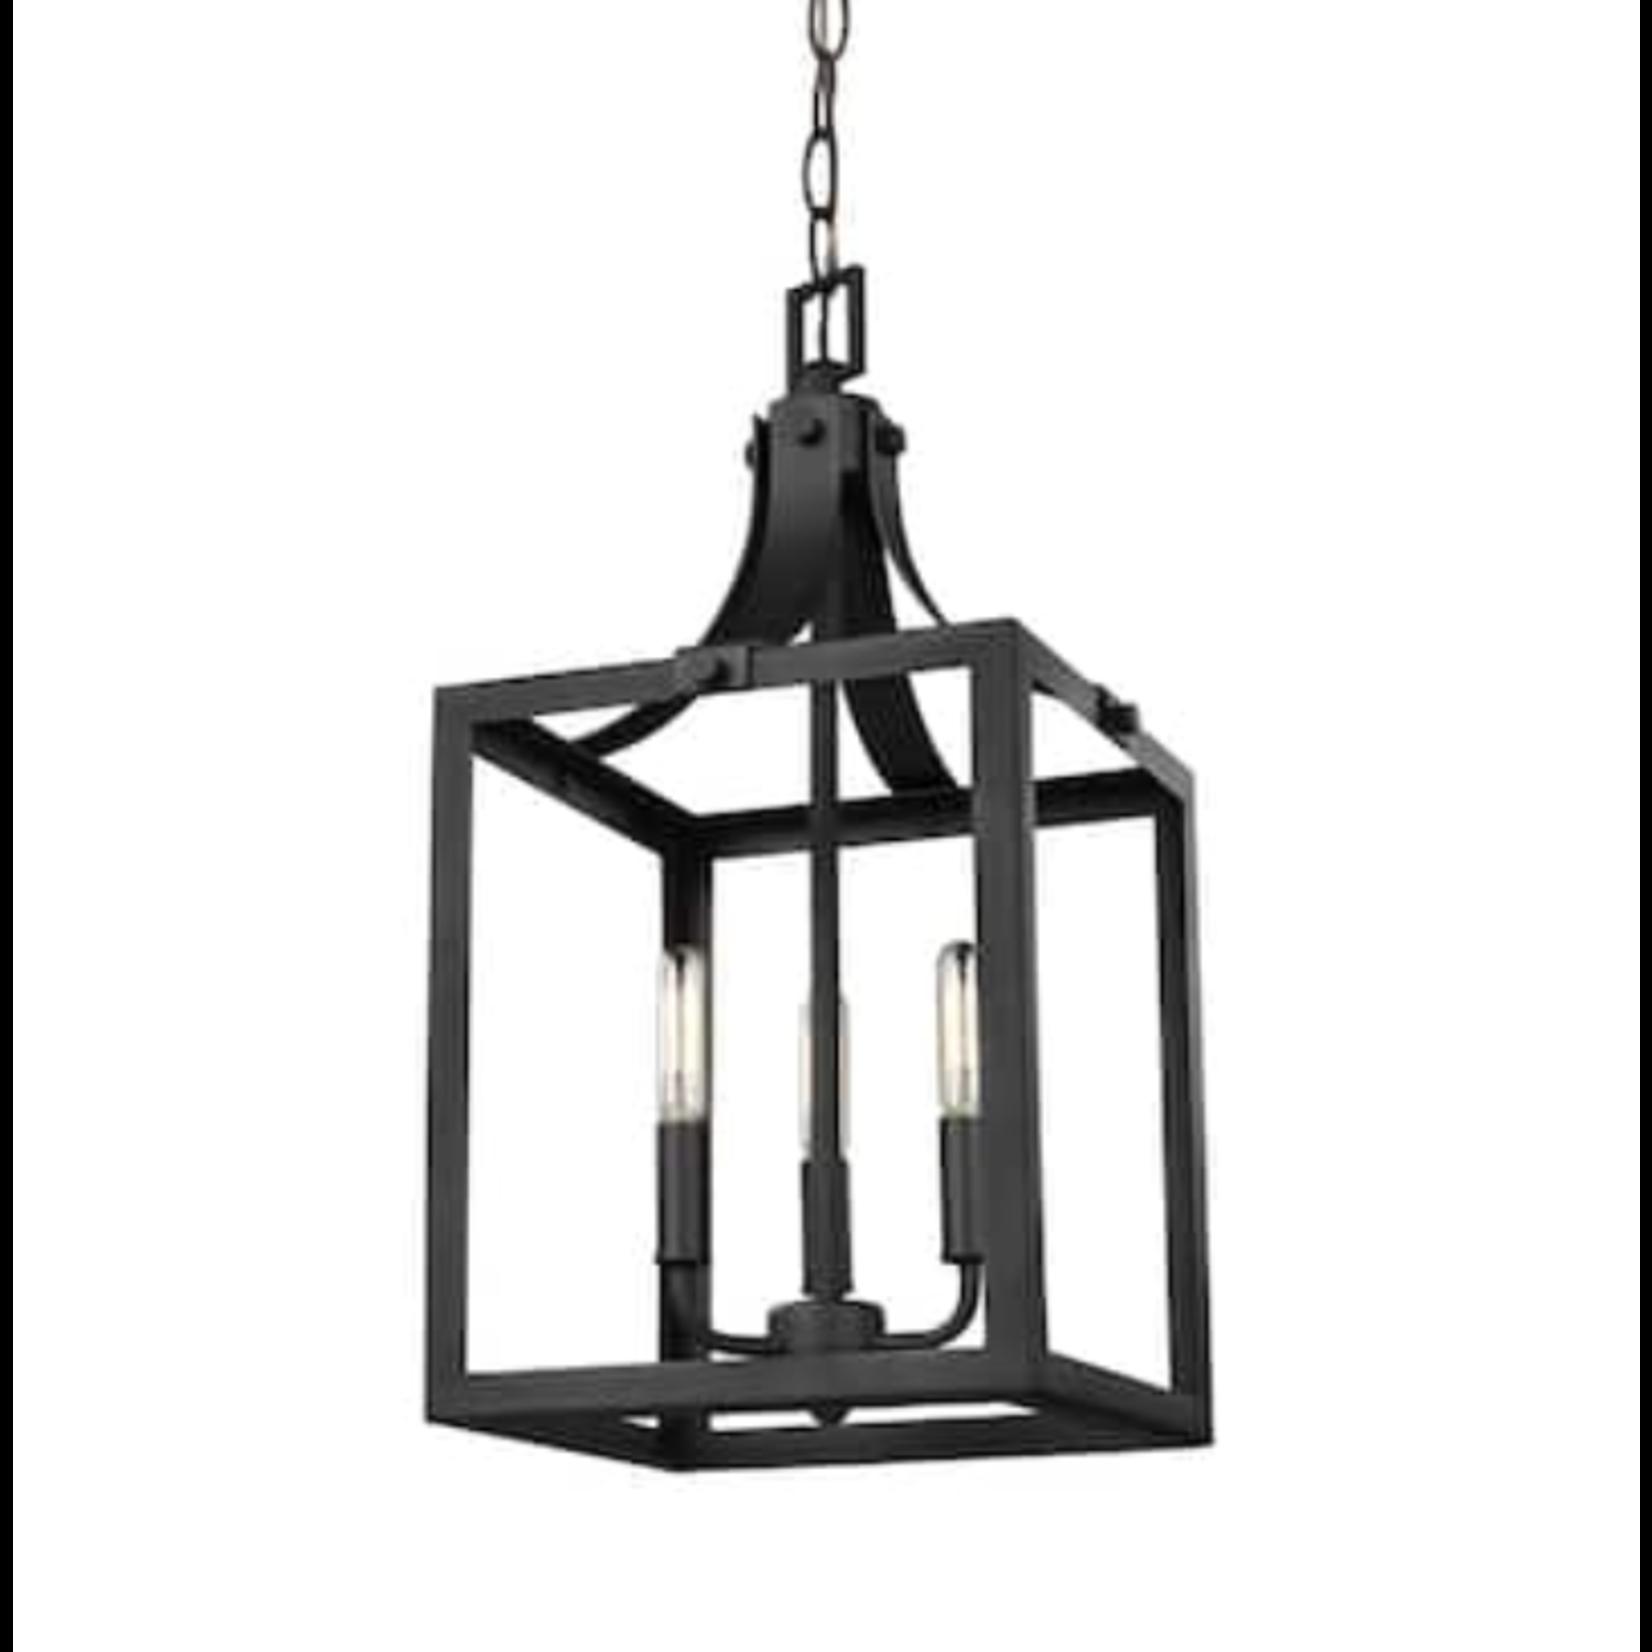 10392 Sea Gull Black Pendant Light